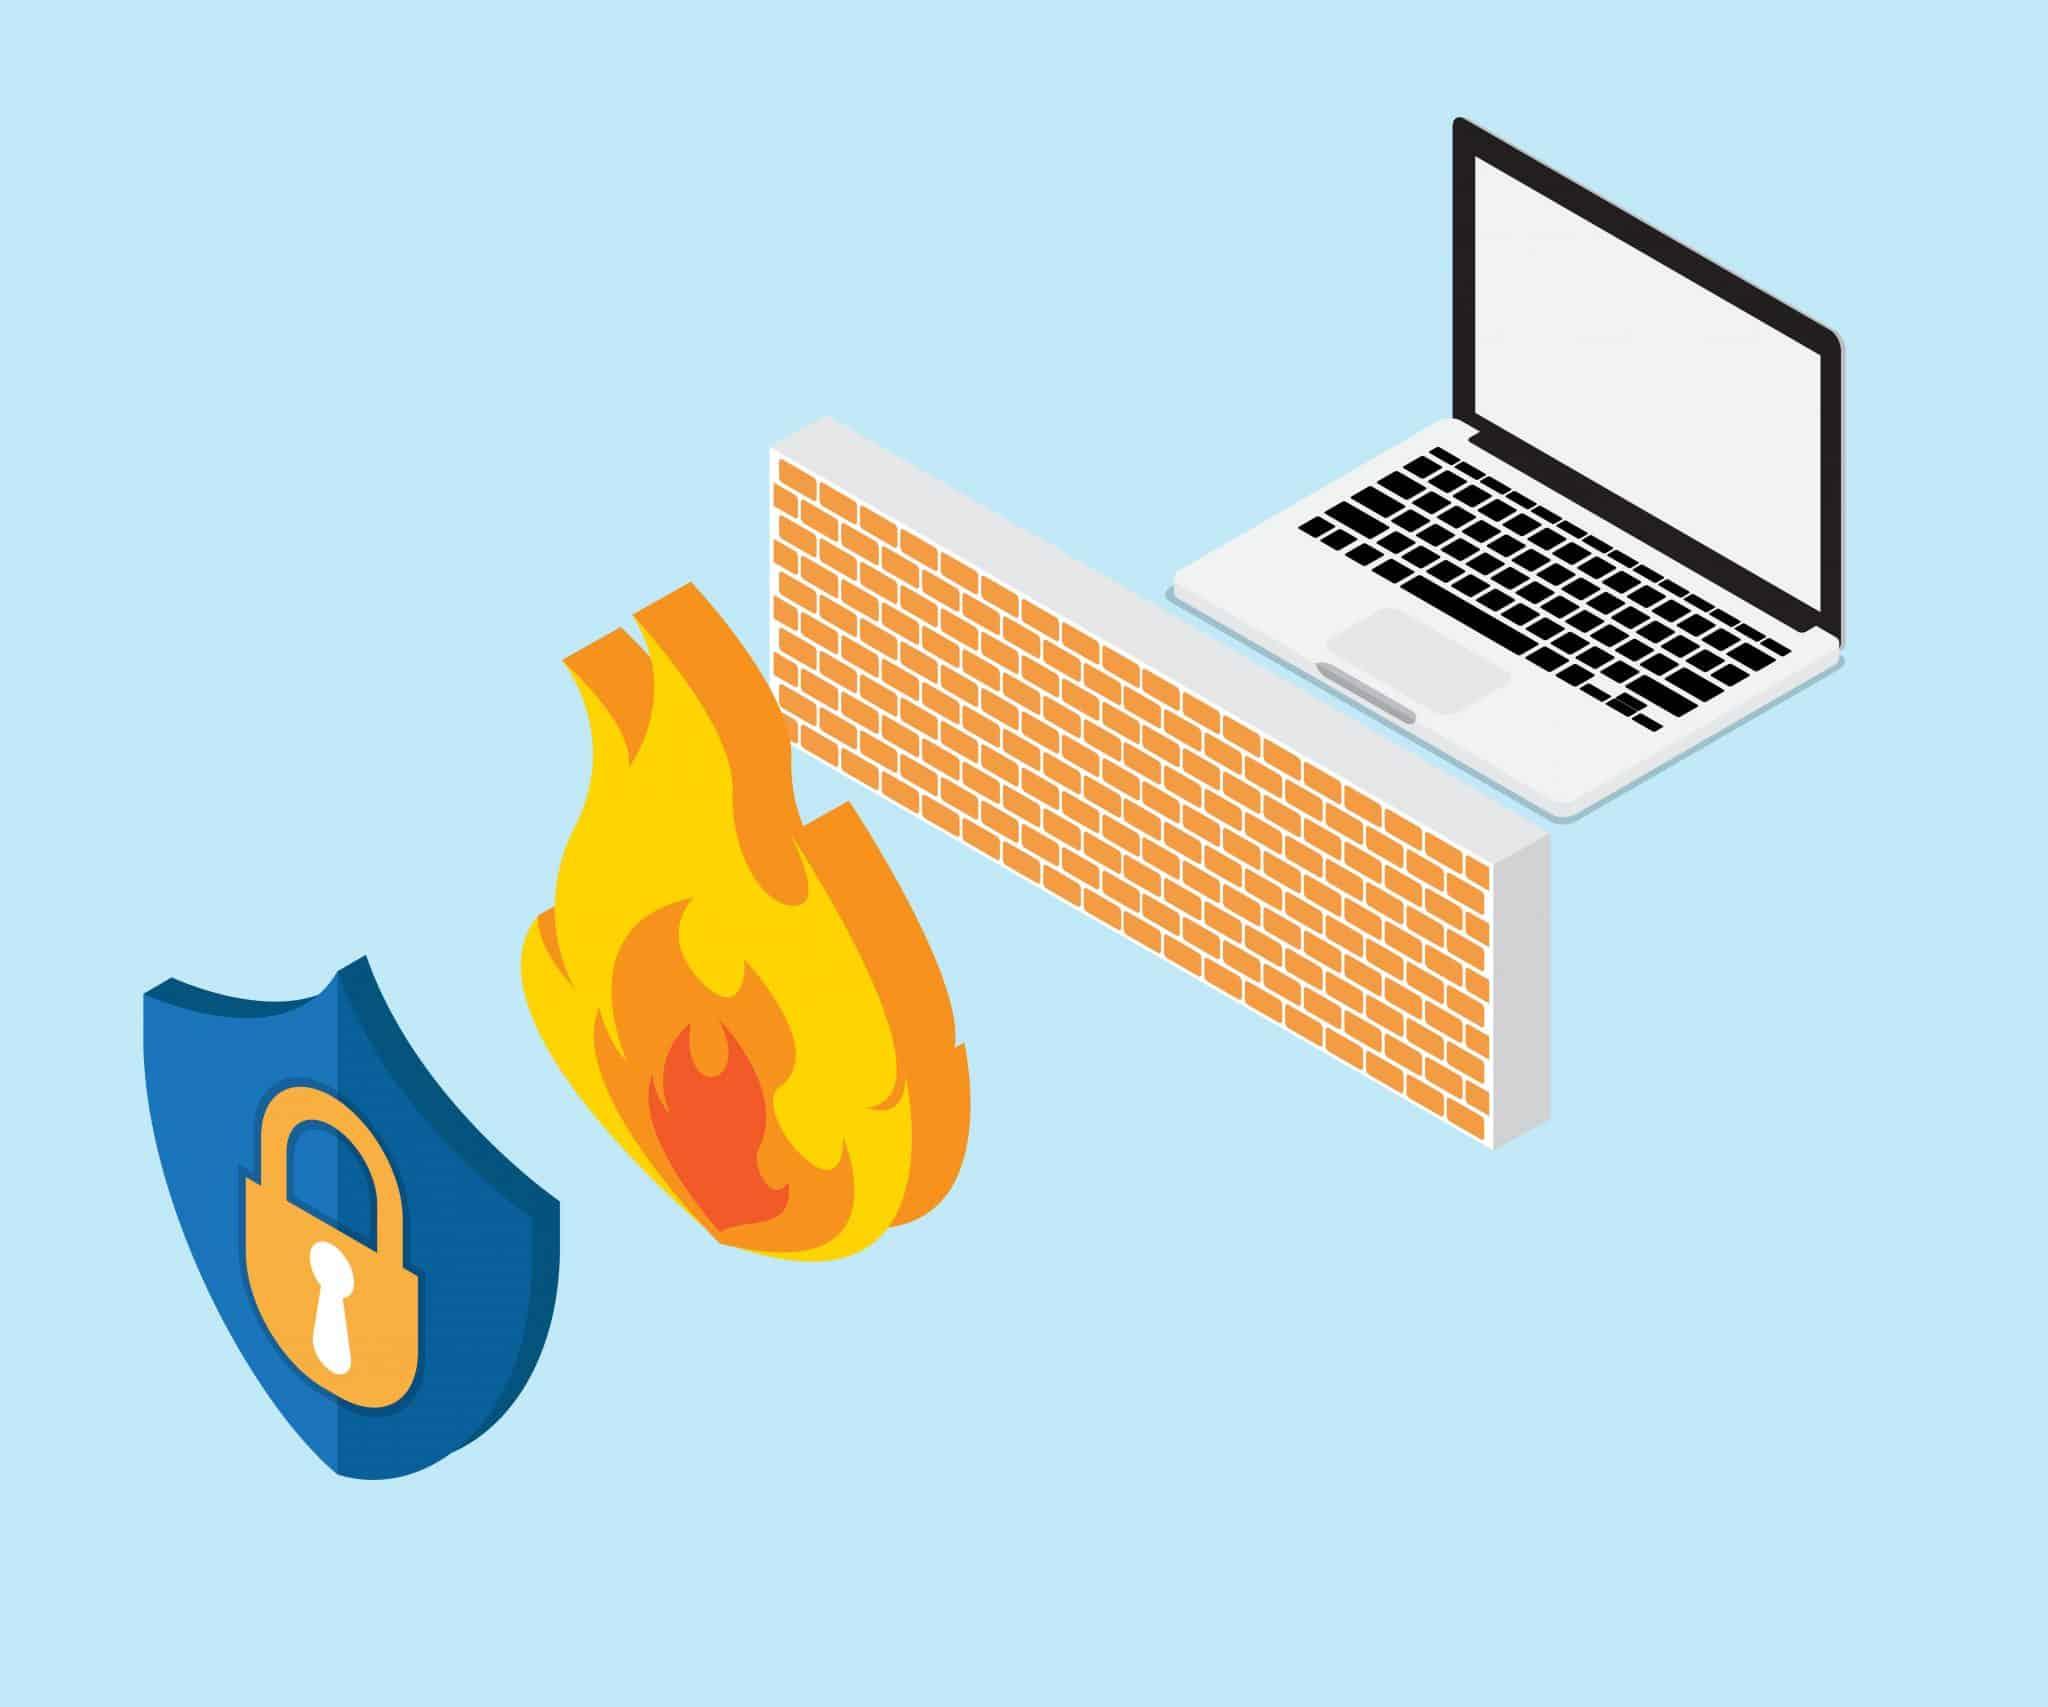 Mengizinkan Aplikasi Tertentu Melewati Firewall